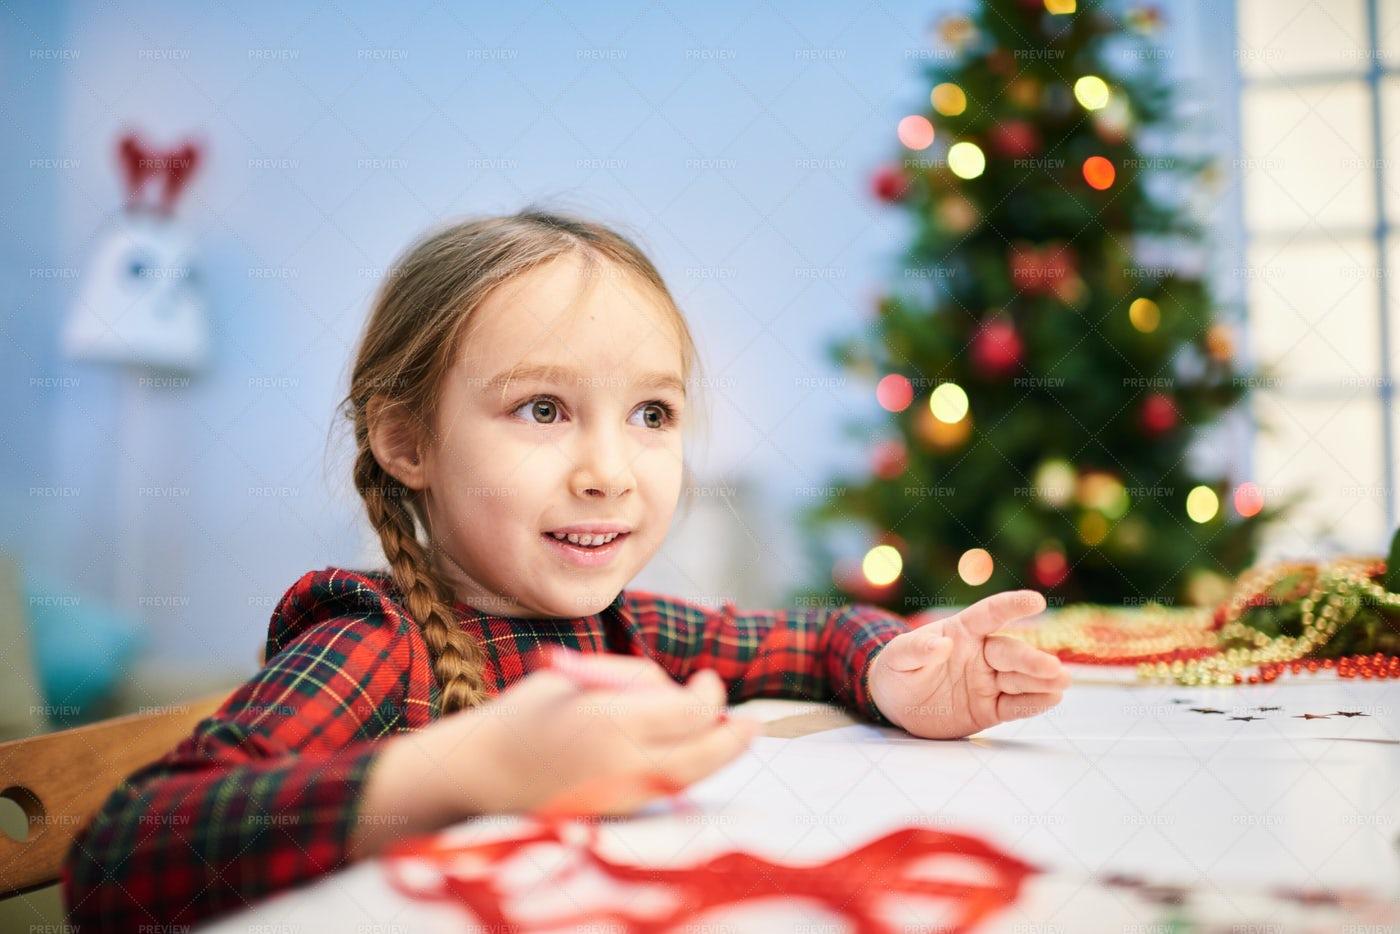 Drawing Christmas Card: Stock Photos